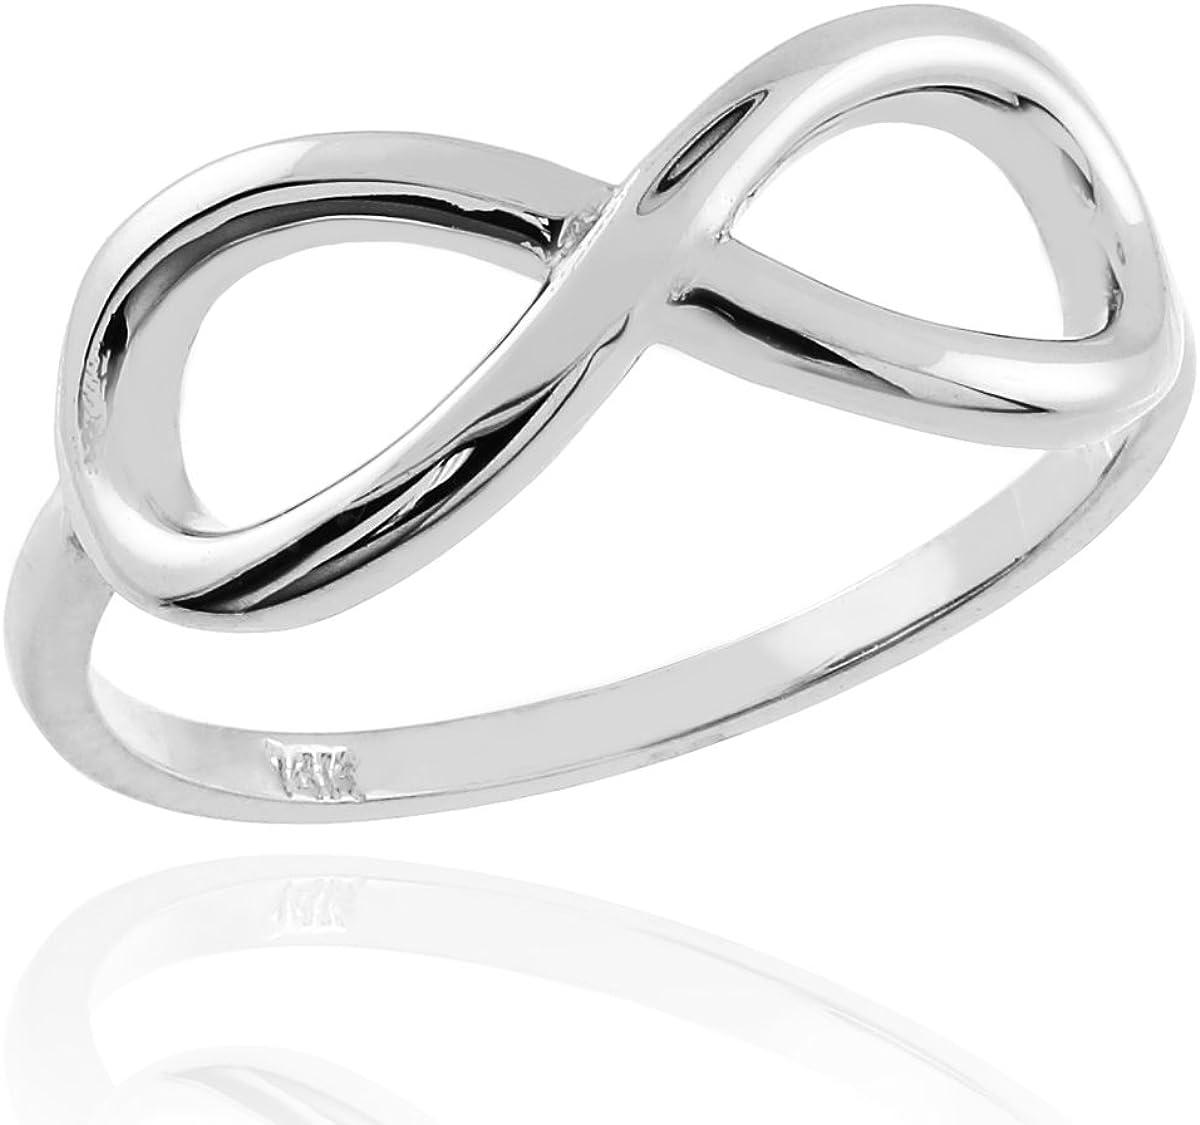 Polished 14k White Gold Infinity Ring